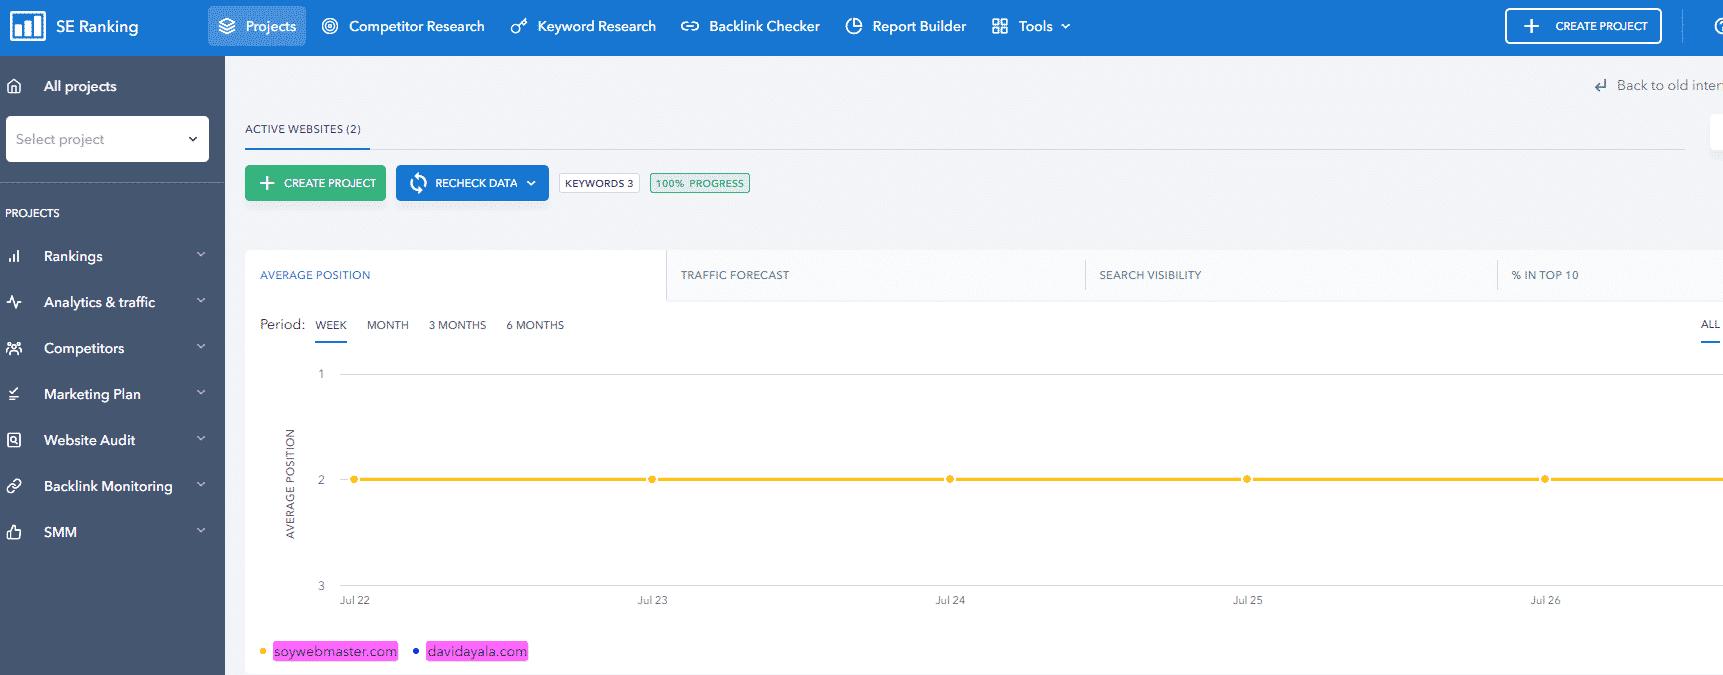 proyecto-se-ranking